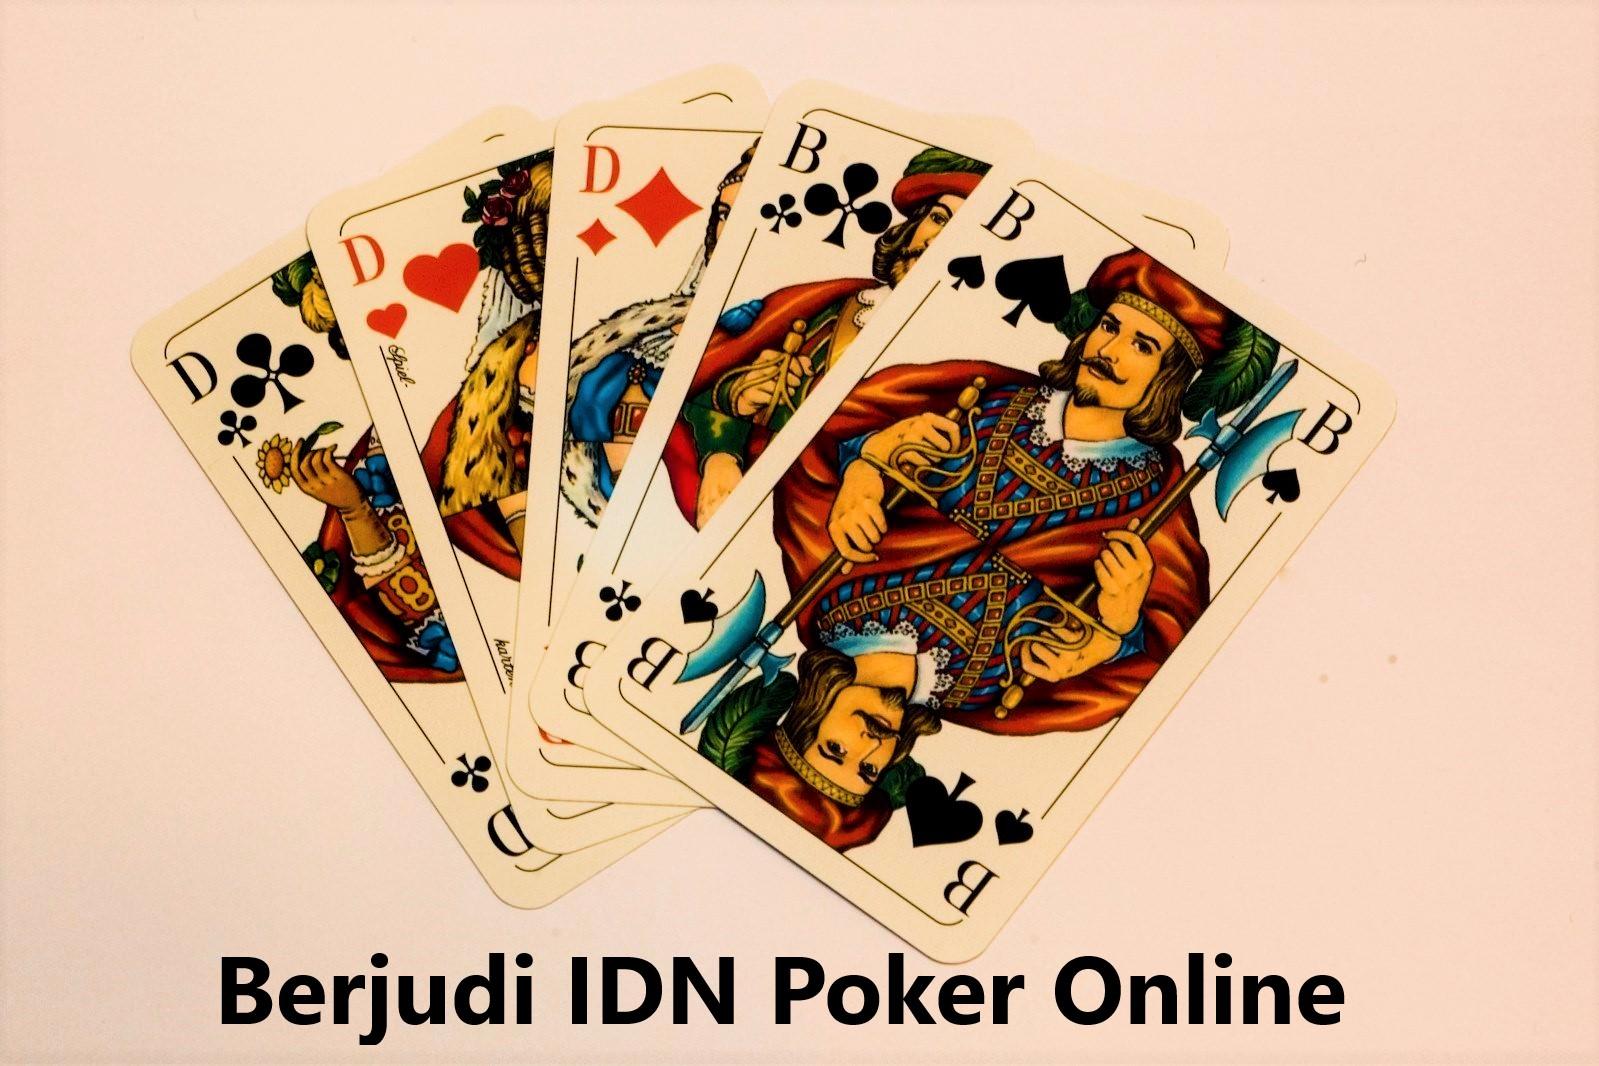 Berjudi IDN Poker Online